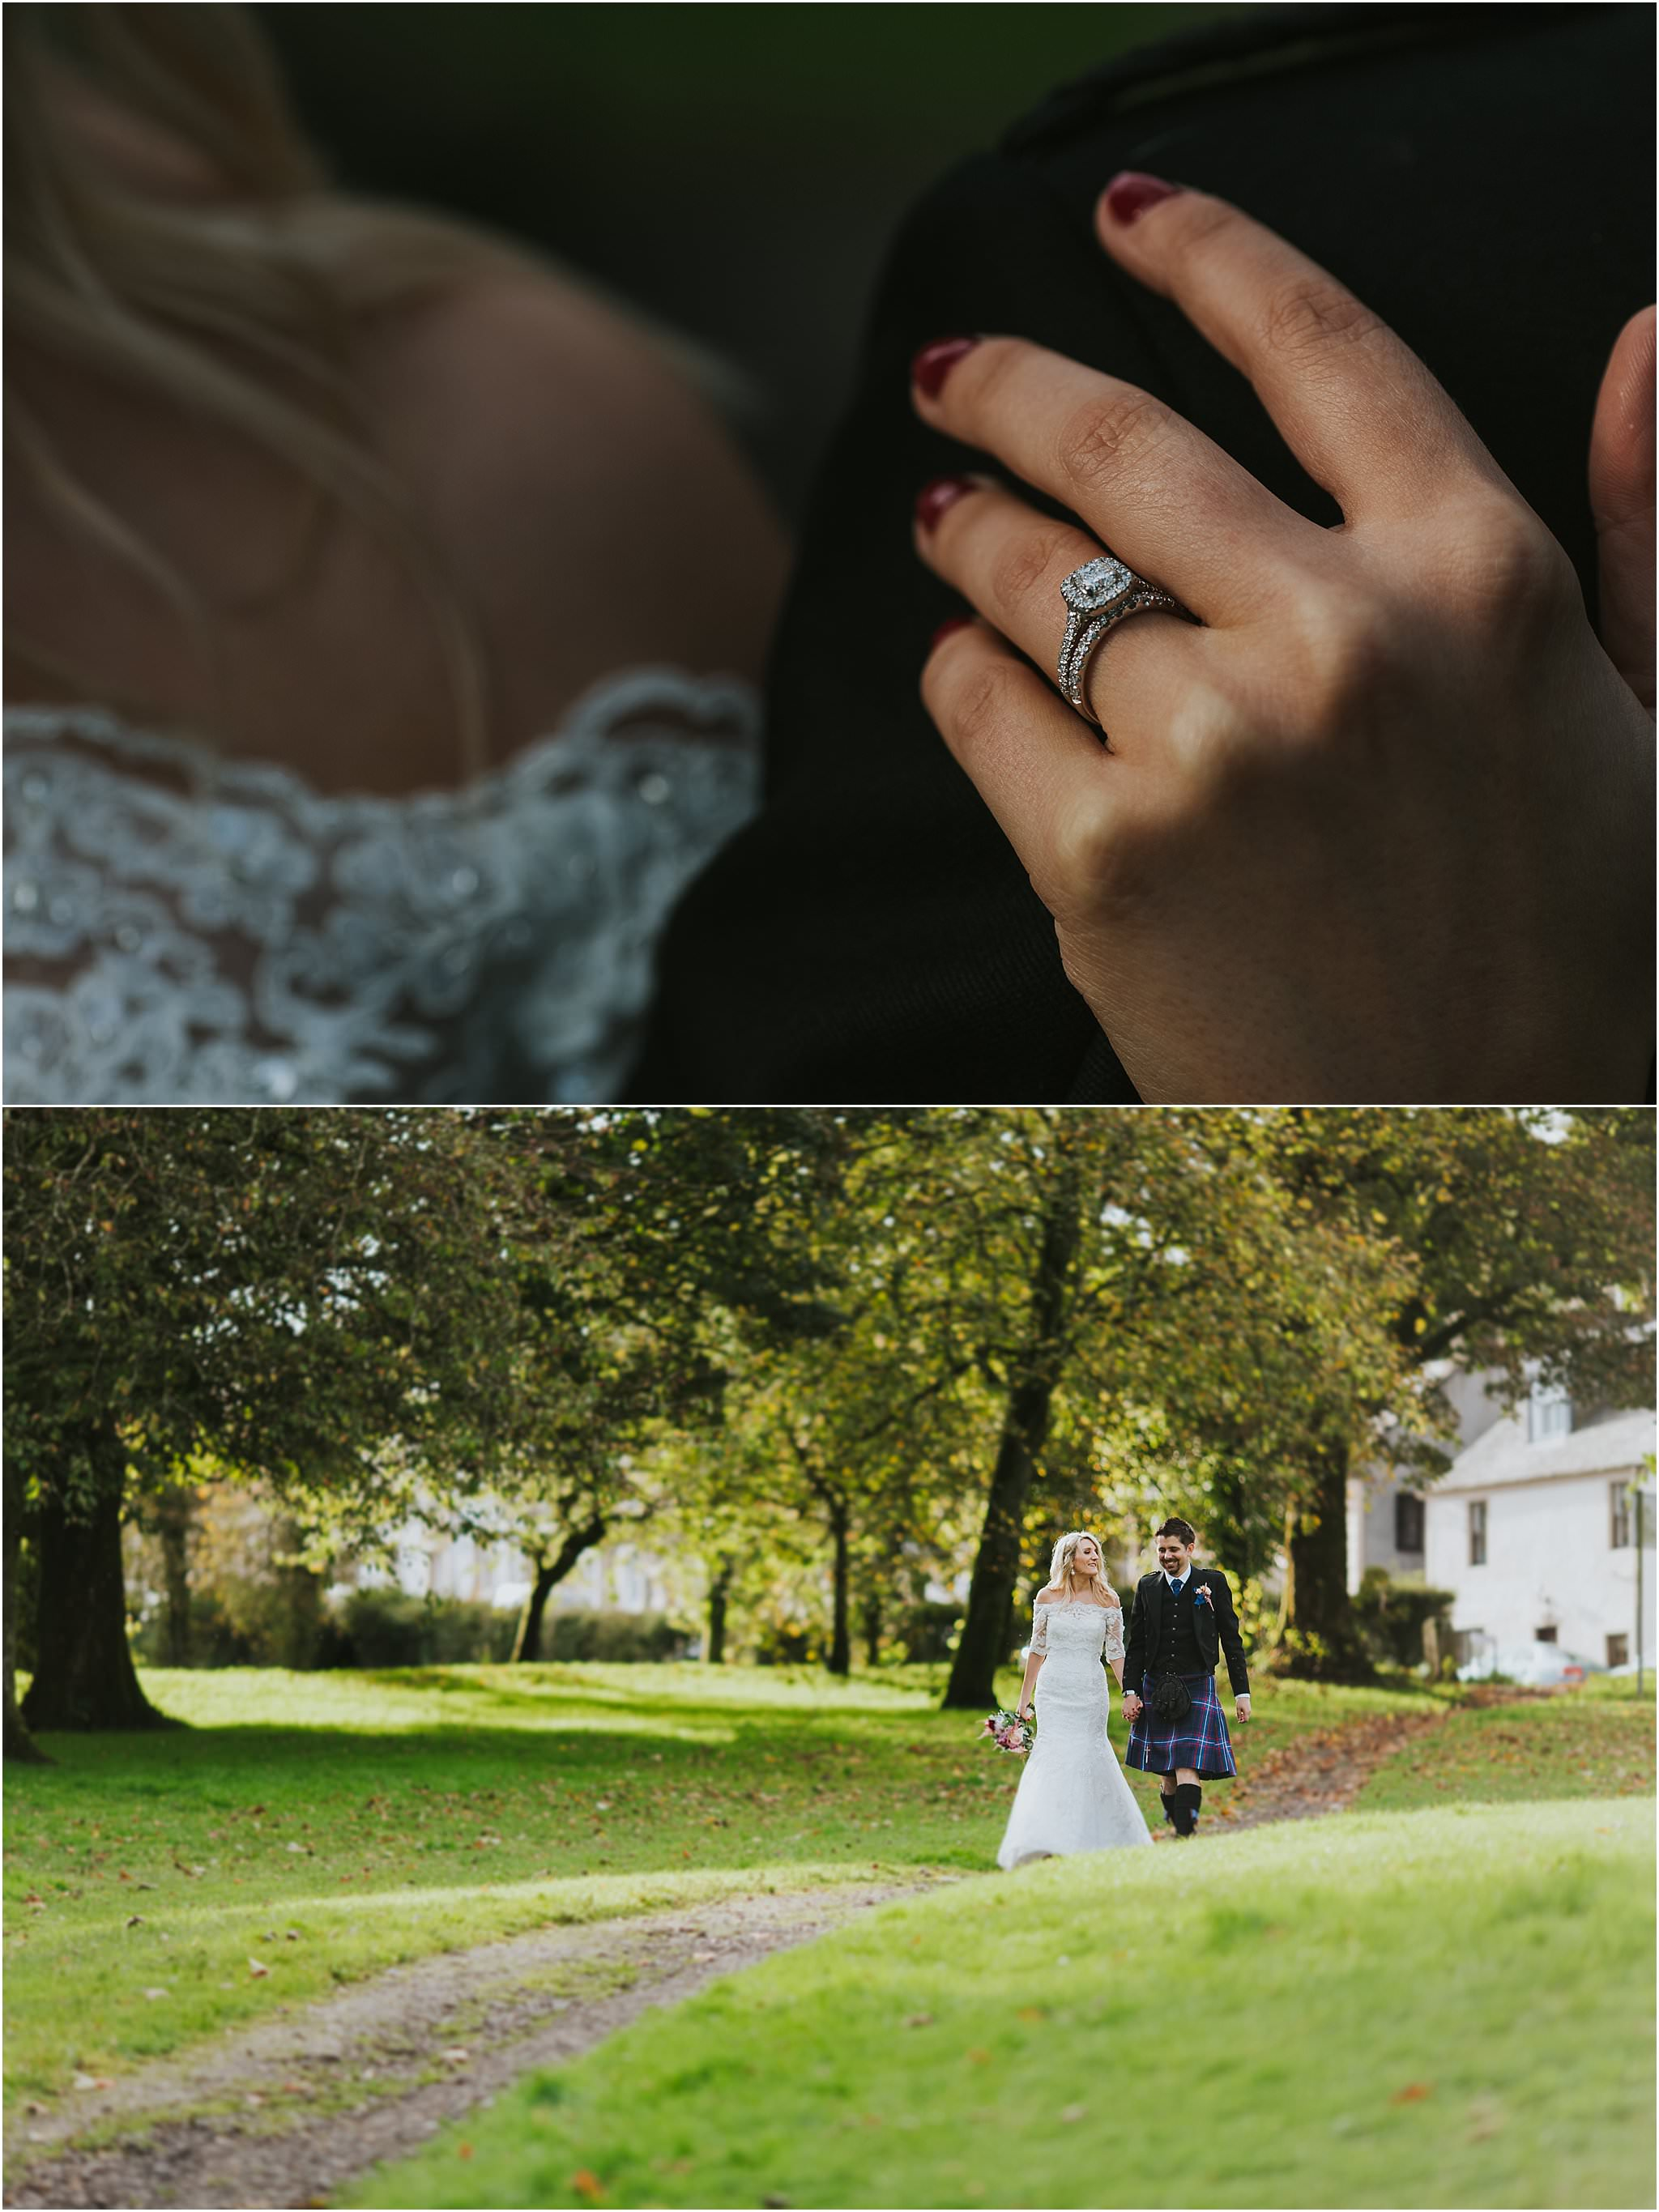 janie-garry-wedding31.jpg